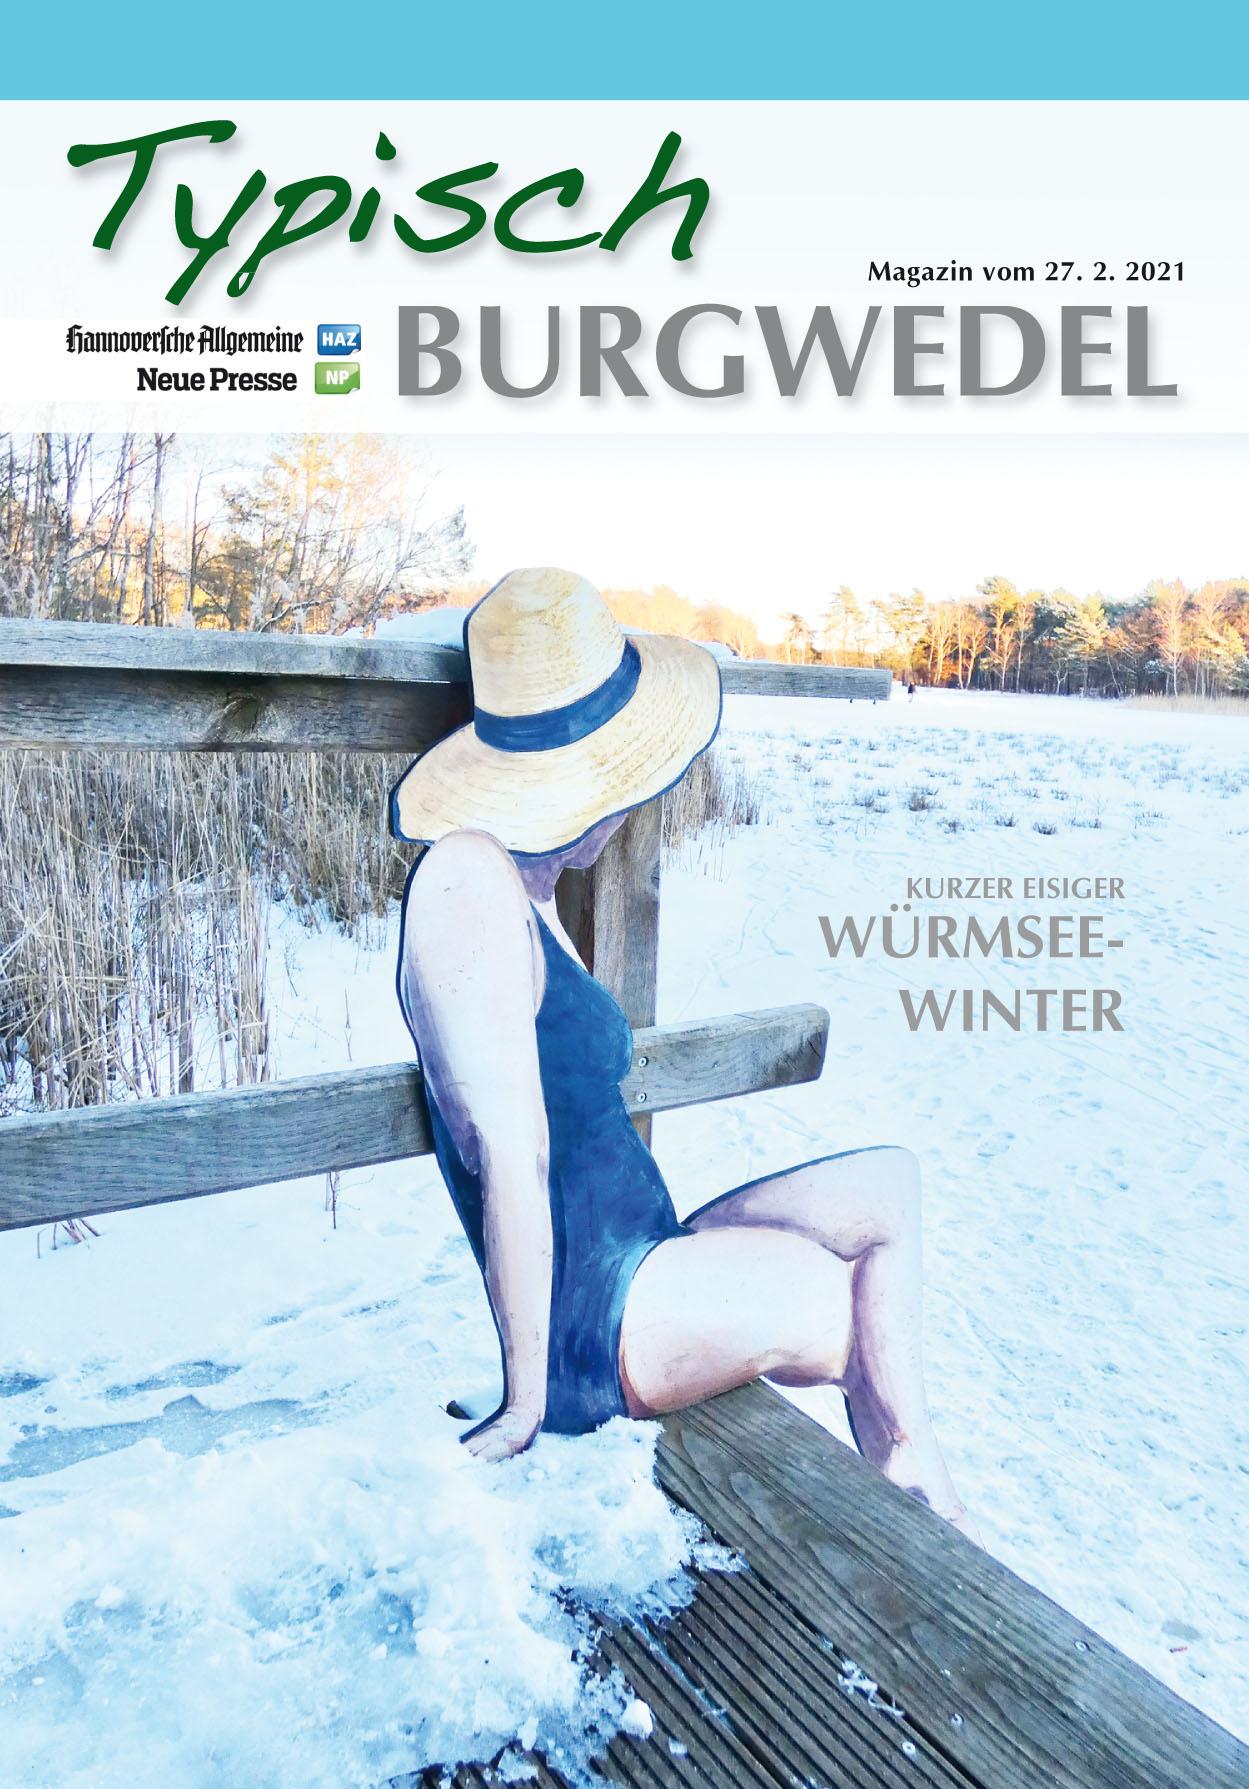 burgwedel 27.02.2021